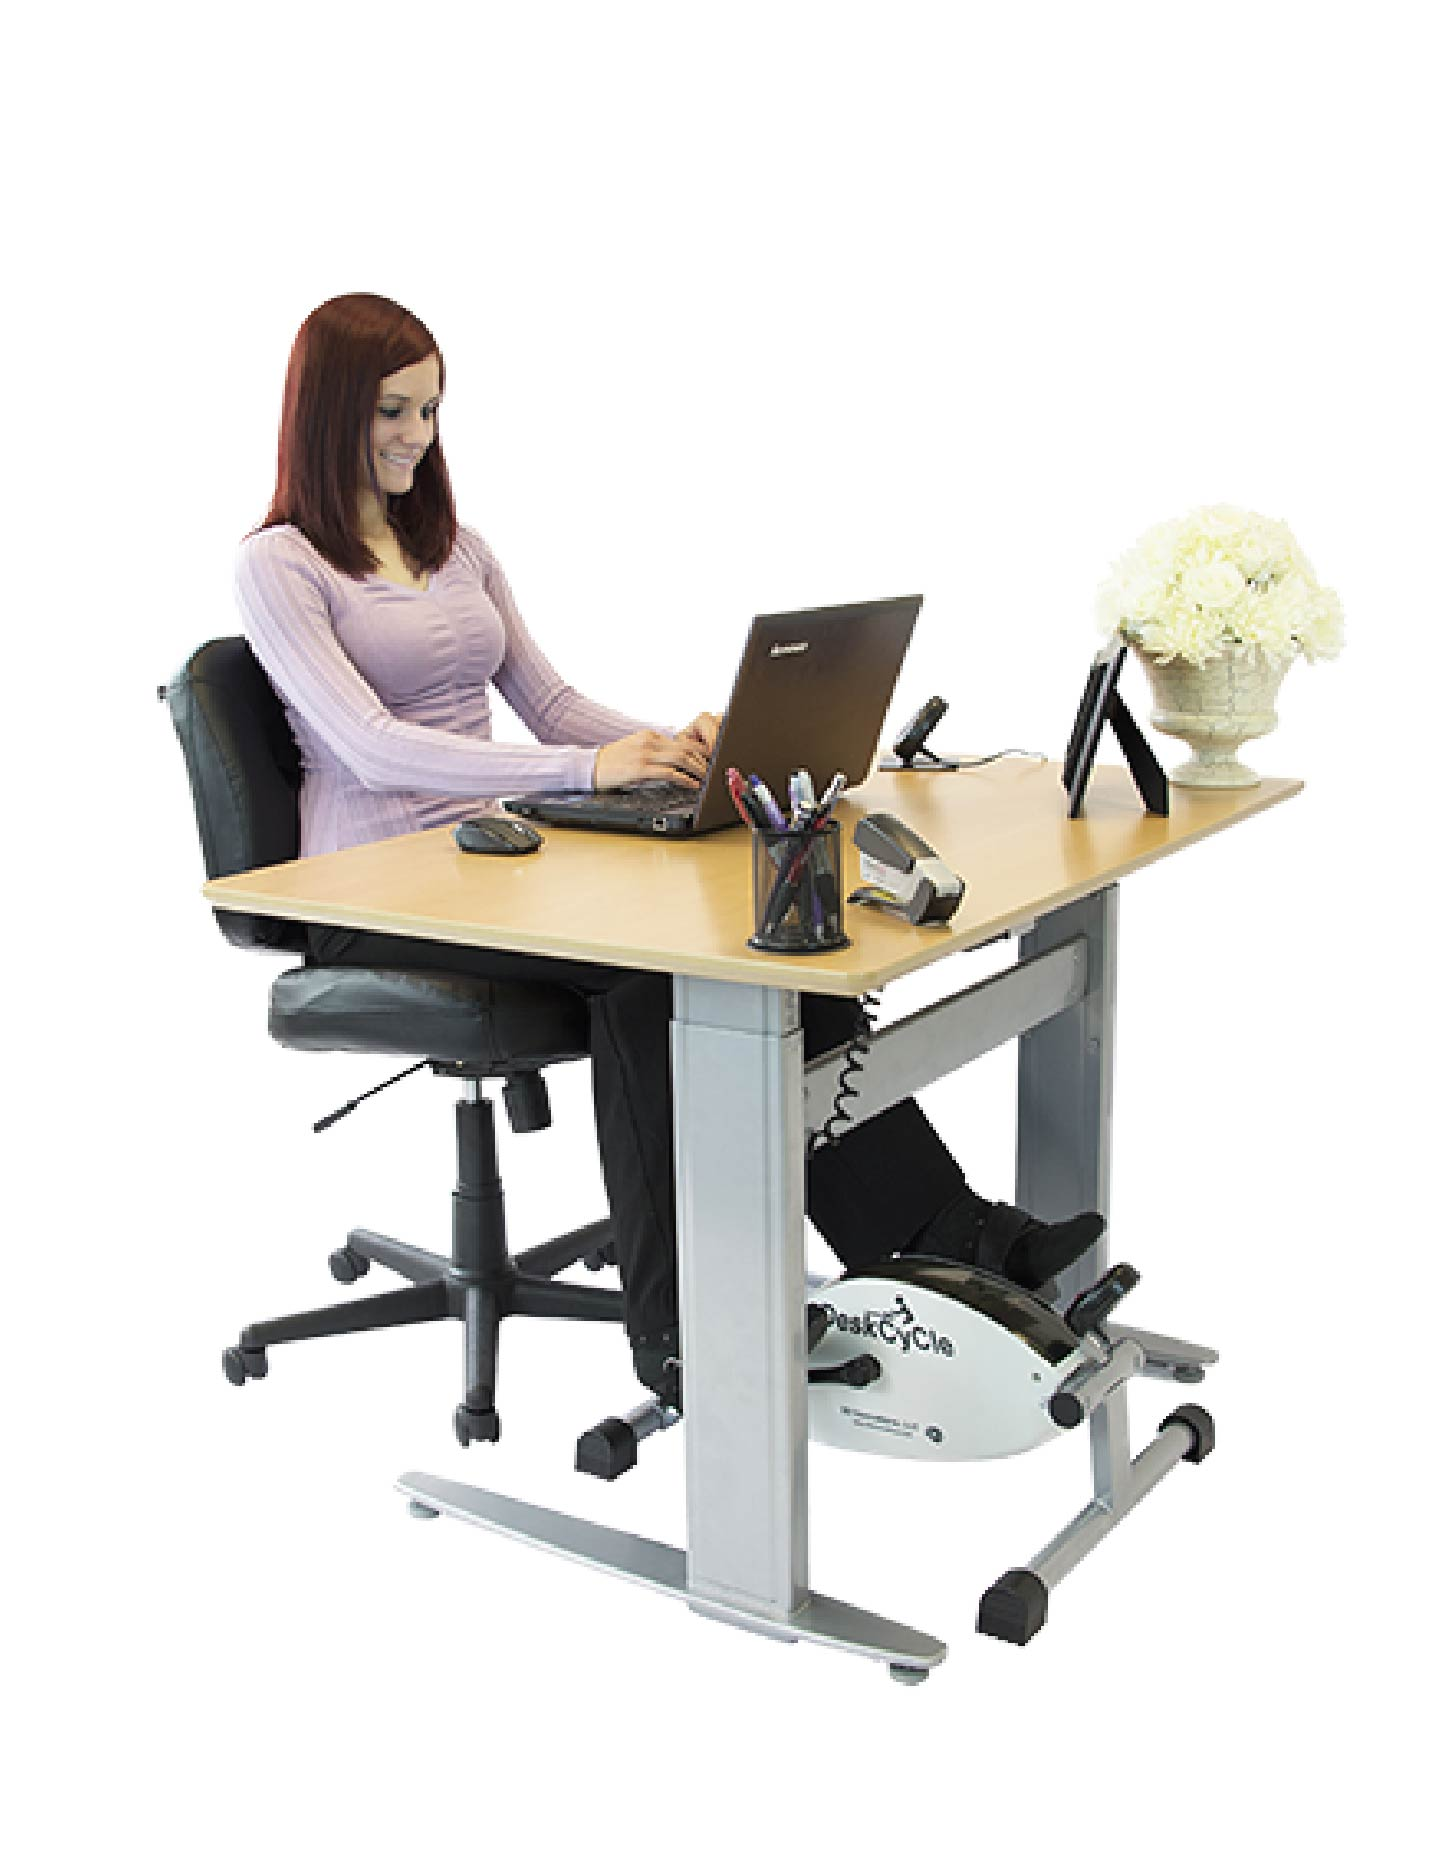 Mini Under Desk Cycle Pedal Exerciser Stayfithk